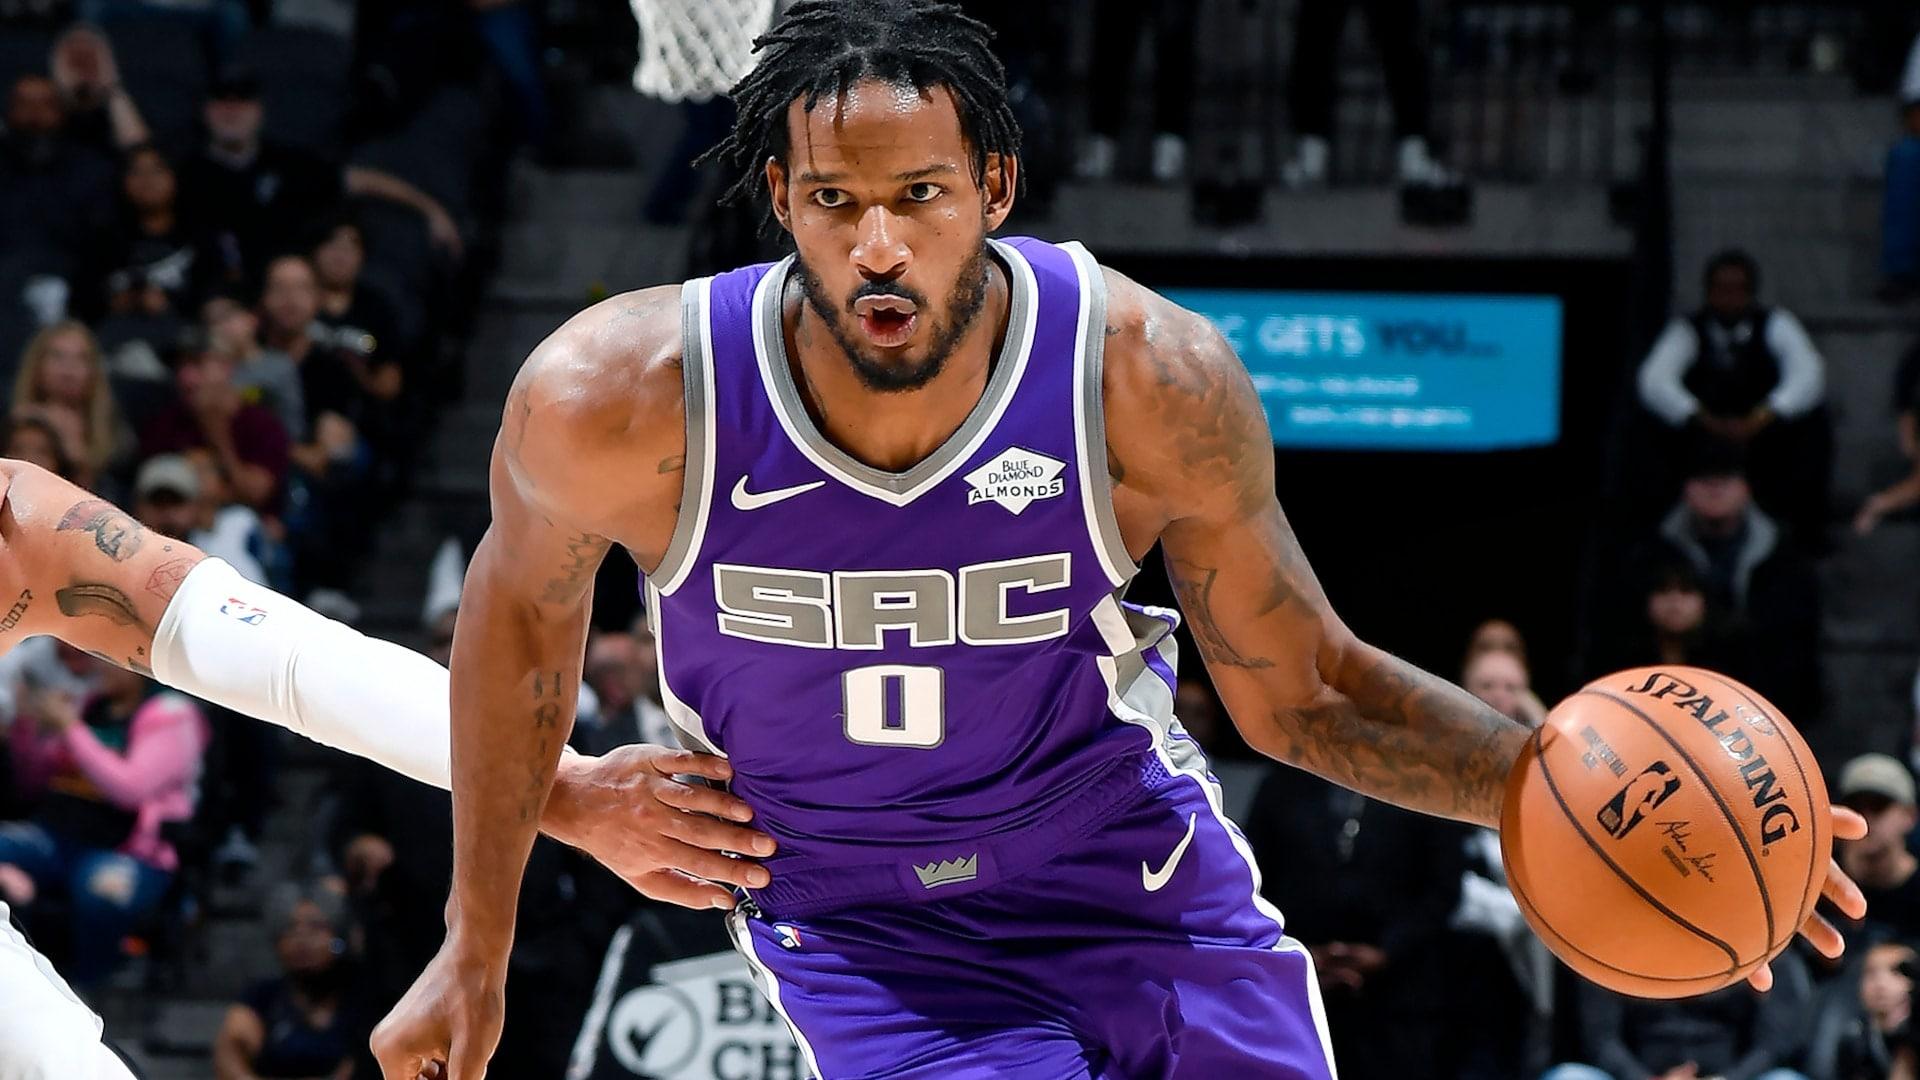 Kings trade Ariza, Gabriel, Swanigan to Blazers for Bazemore, Tolliver, Draft picks